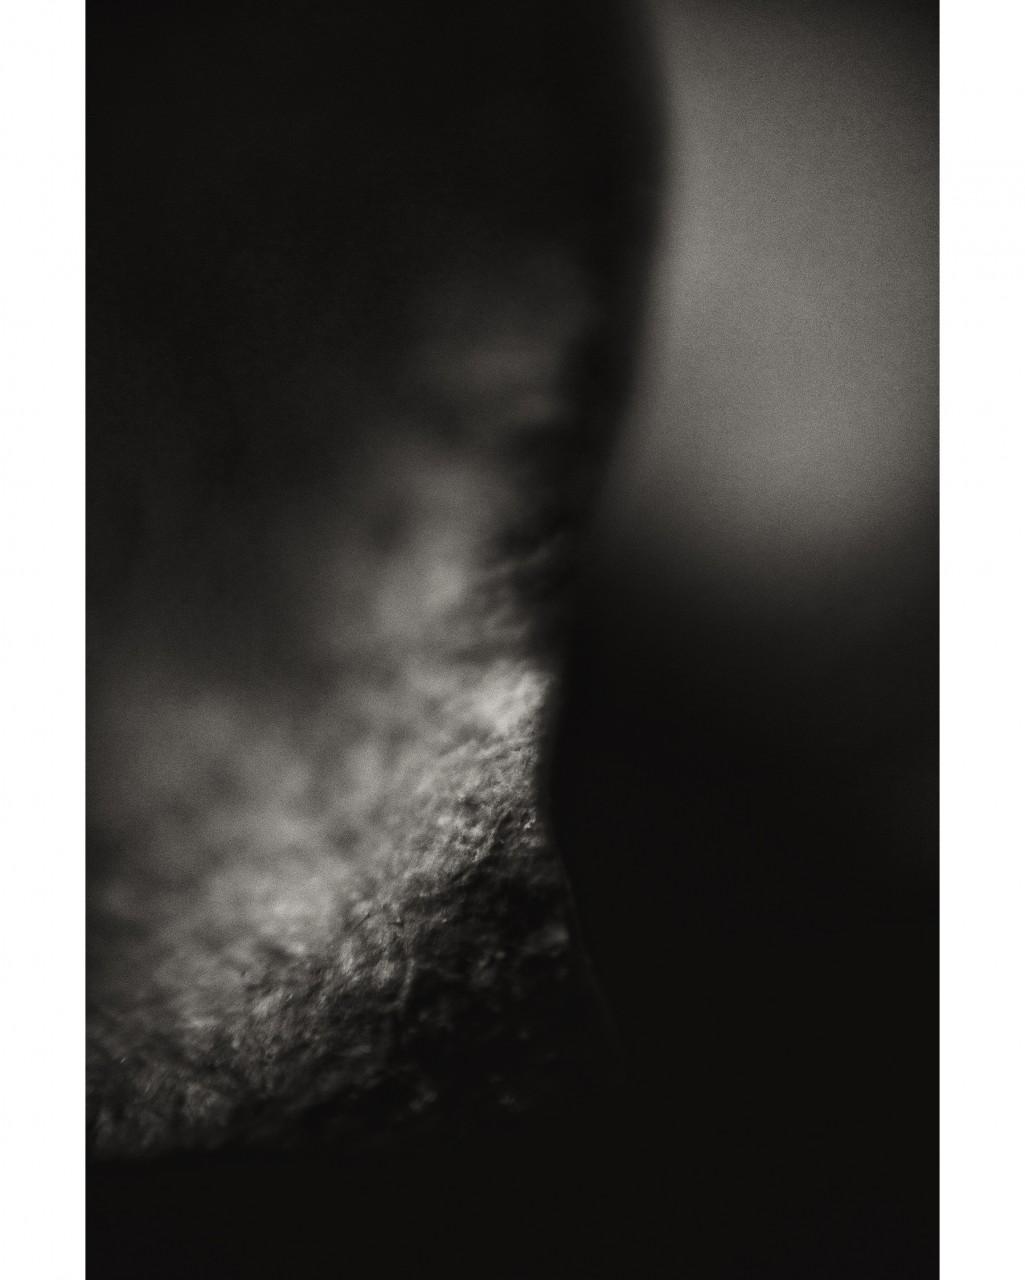 21_Dark Form_3993